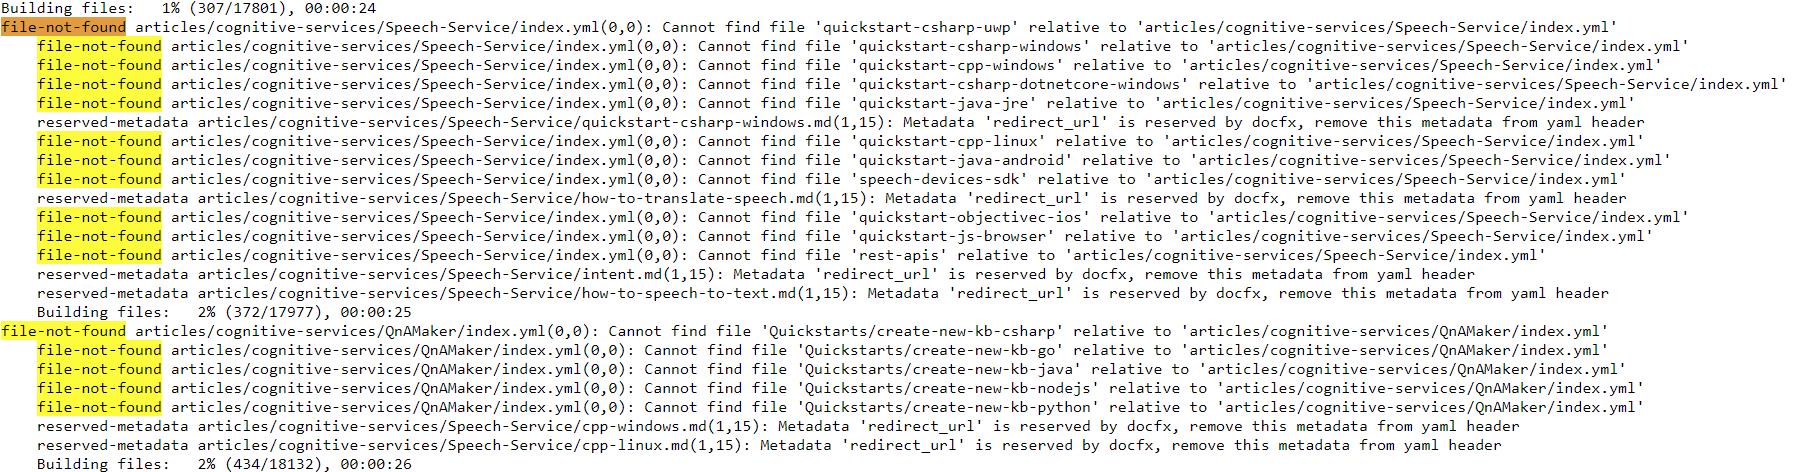 landingData throws a lot of `file not found` warnings